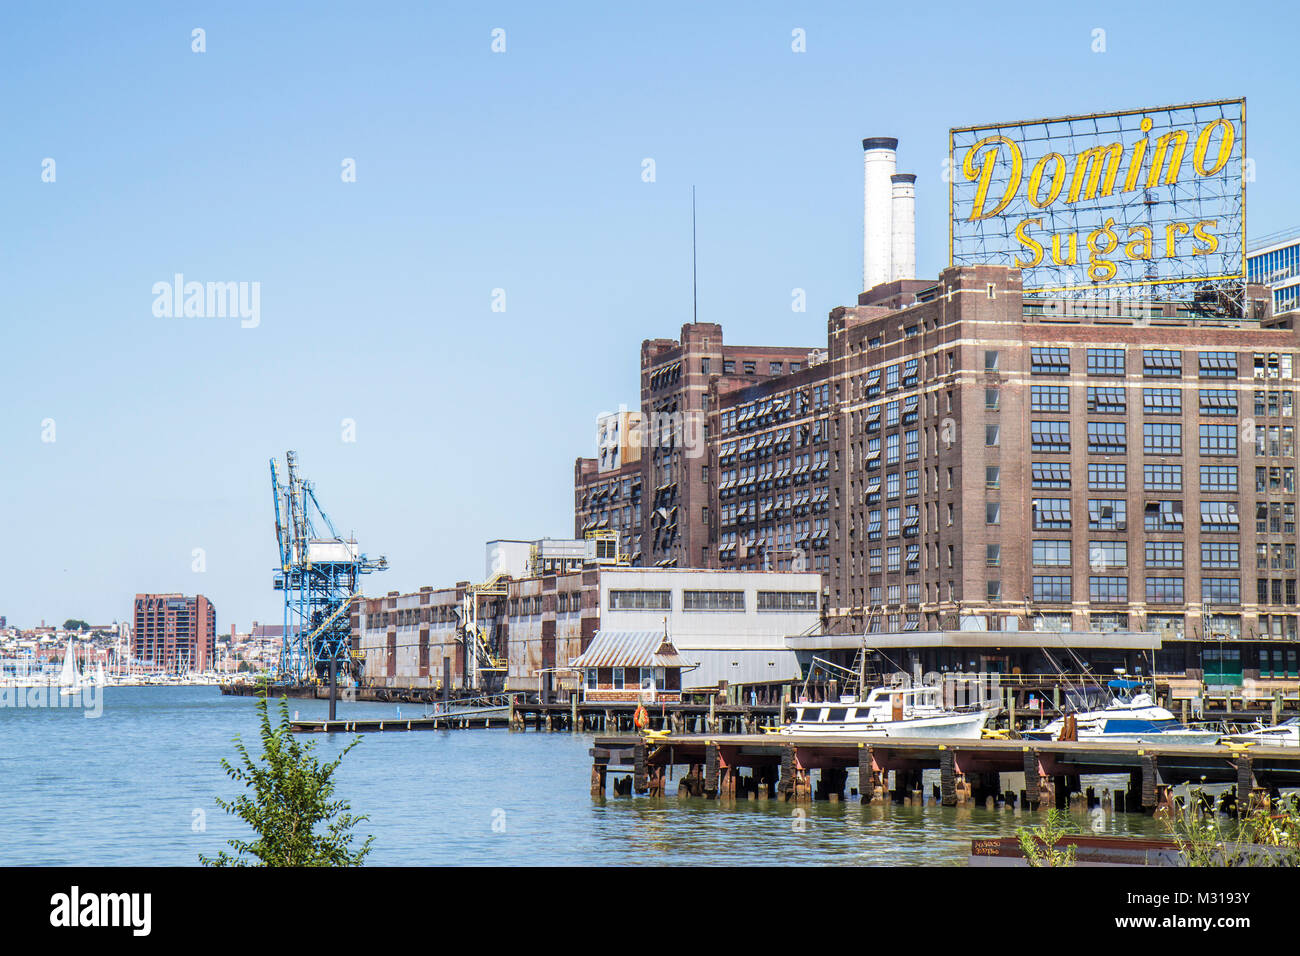 Baltimore Maryland Patapsco River port waterfront Domino Sugar sugarcane refining plant sign smokestack dock business - Stock Image